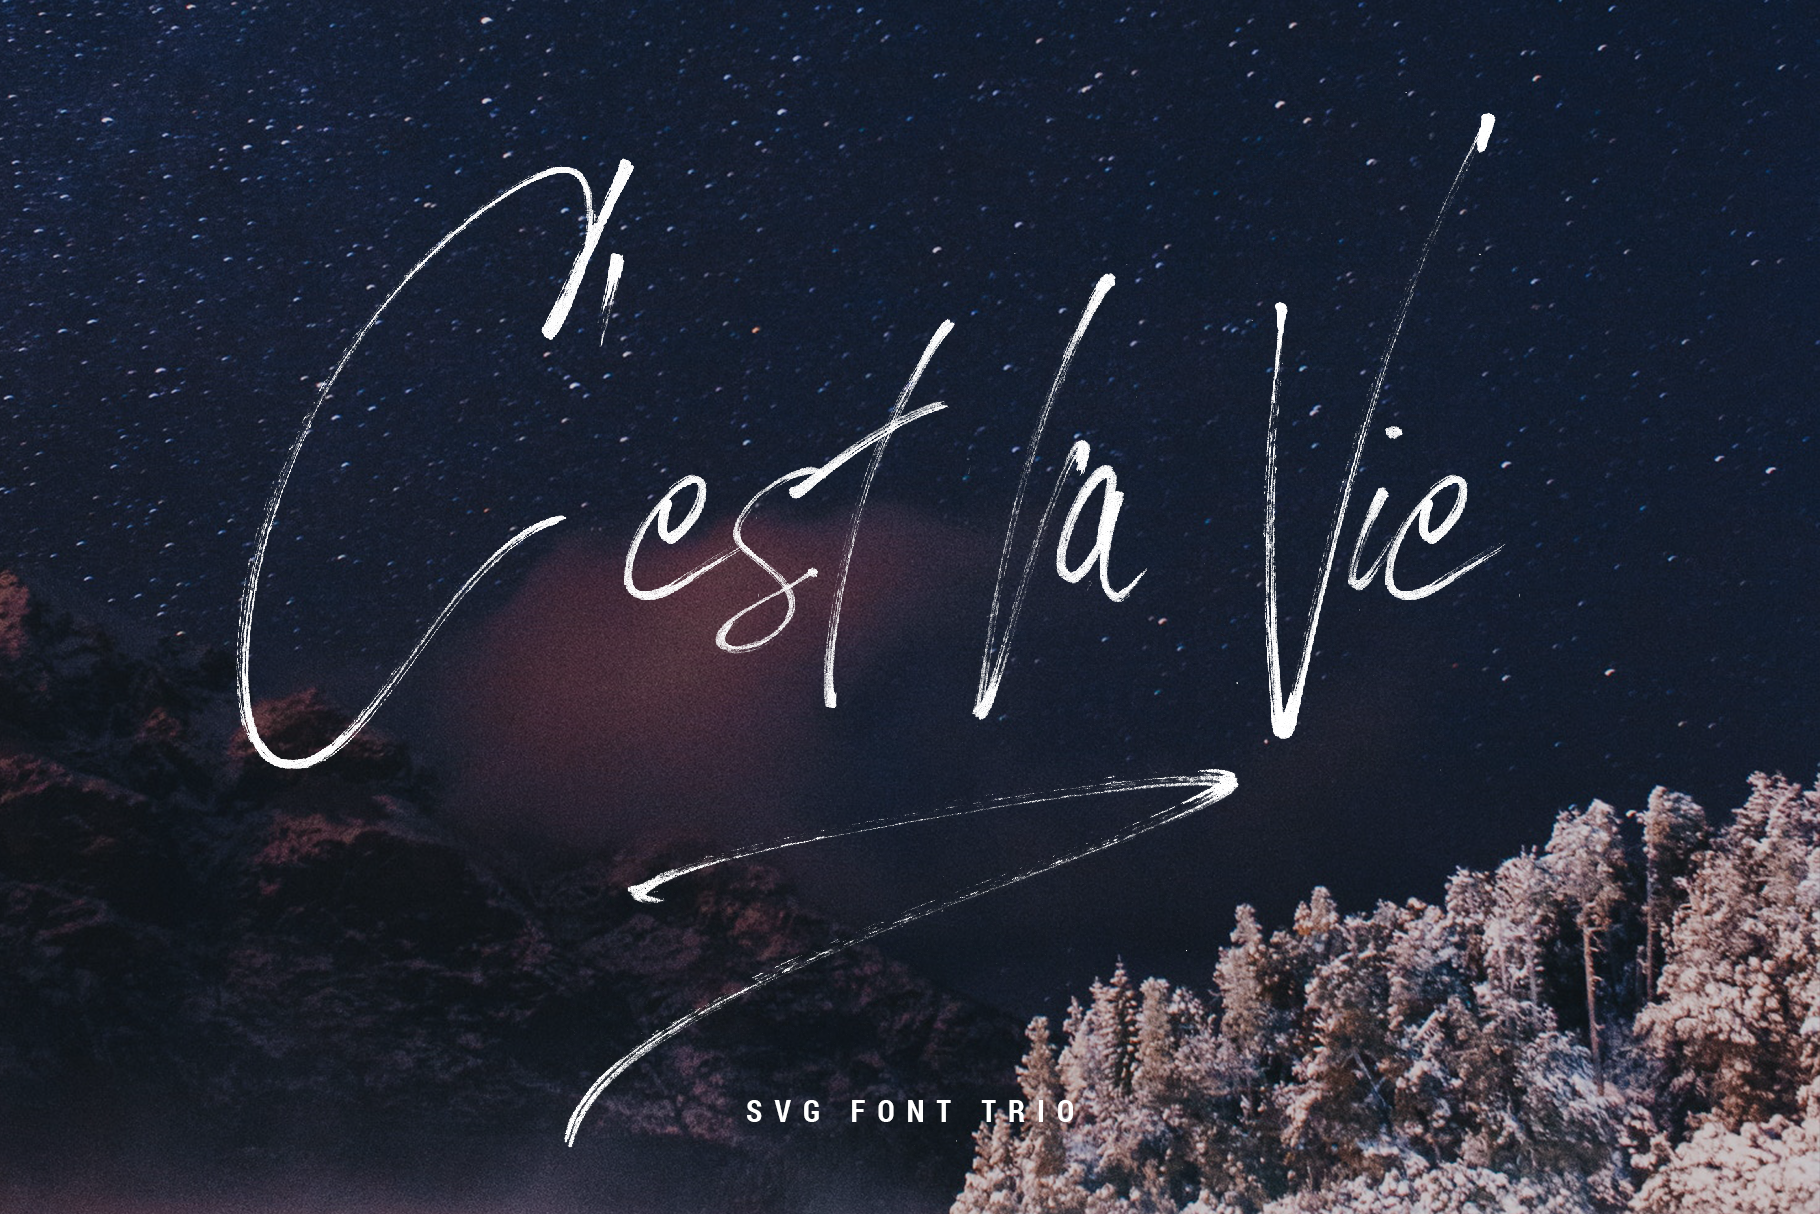 Loving Celine Signature SVG Font Trio - Modern Brush Fonts example image 3